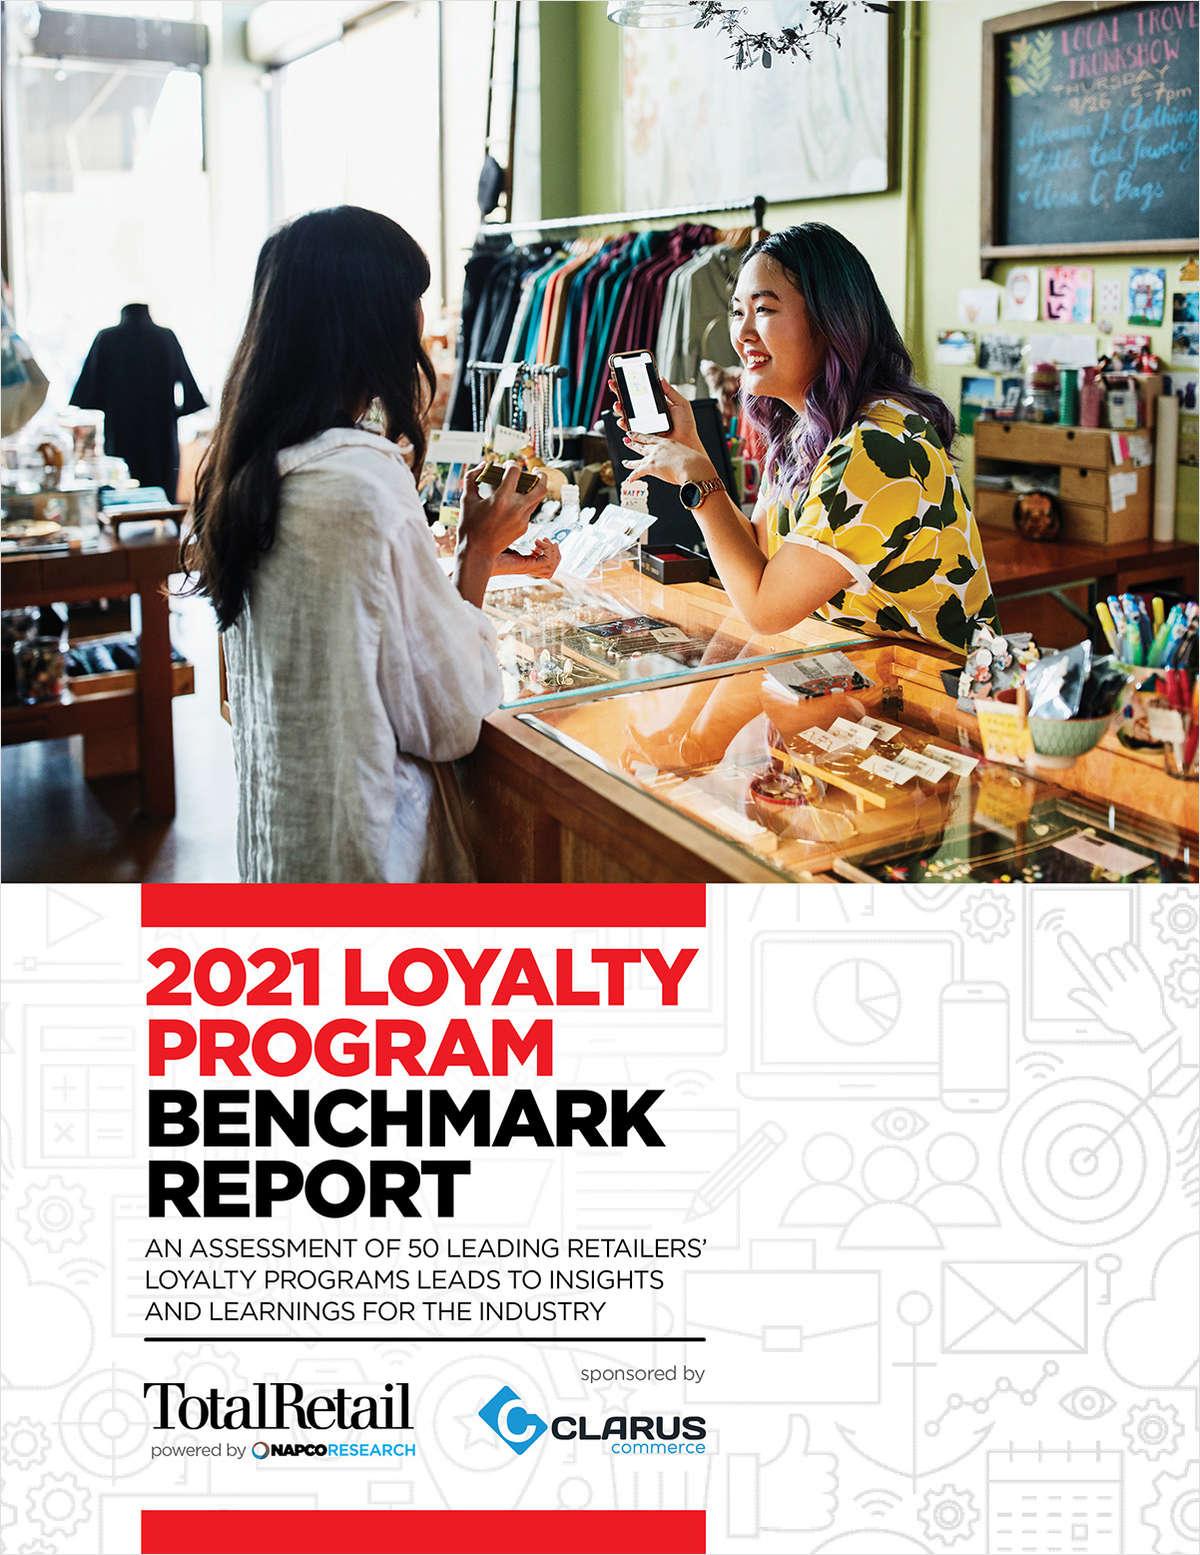 2021 Loyalty Program Benchmark Report